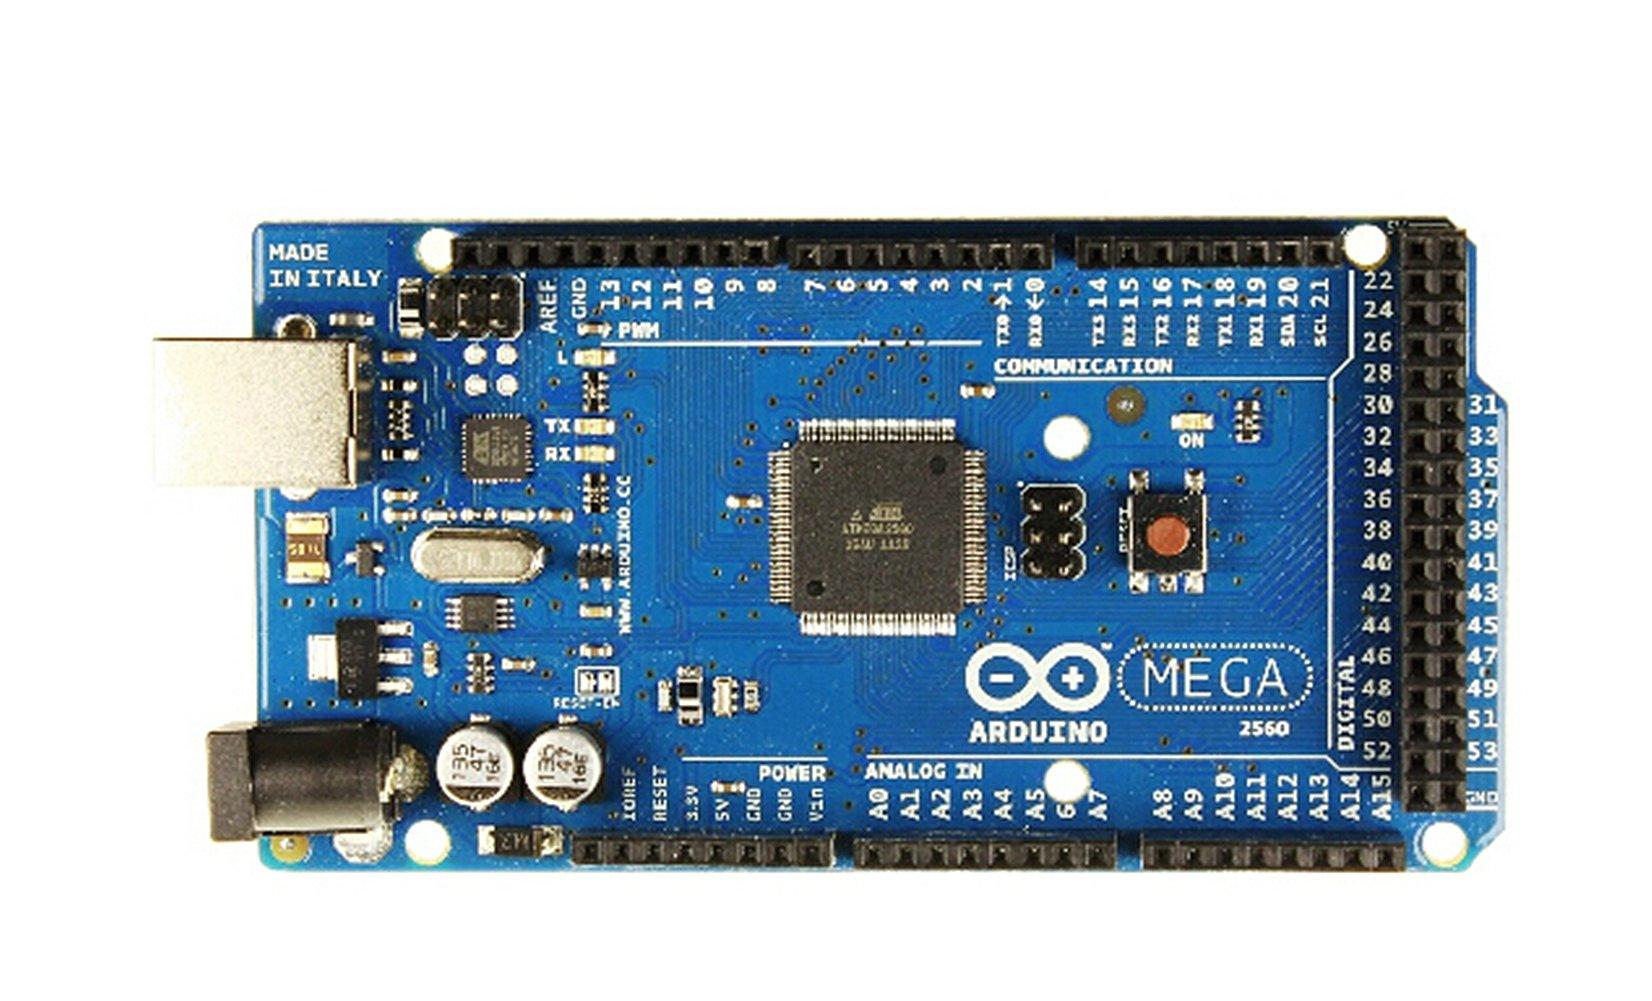 DF Arduino Mega2560 Rev3/With 54 Digital I/O Port/16 Analog Input Port/4 Uarts/A 16 Mhz Crystal Oscillator/A USB Connection/A Power Jack